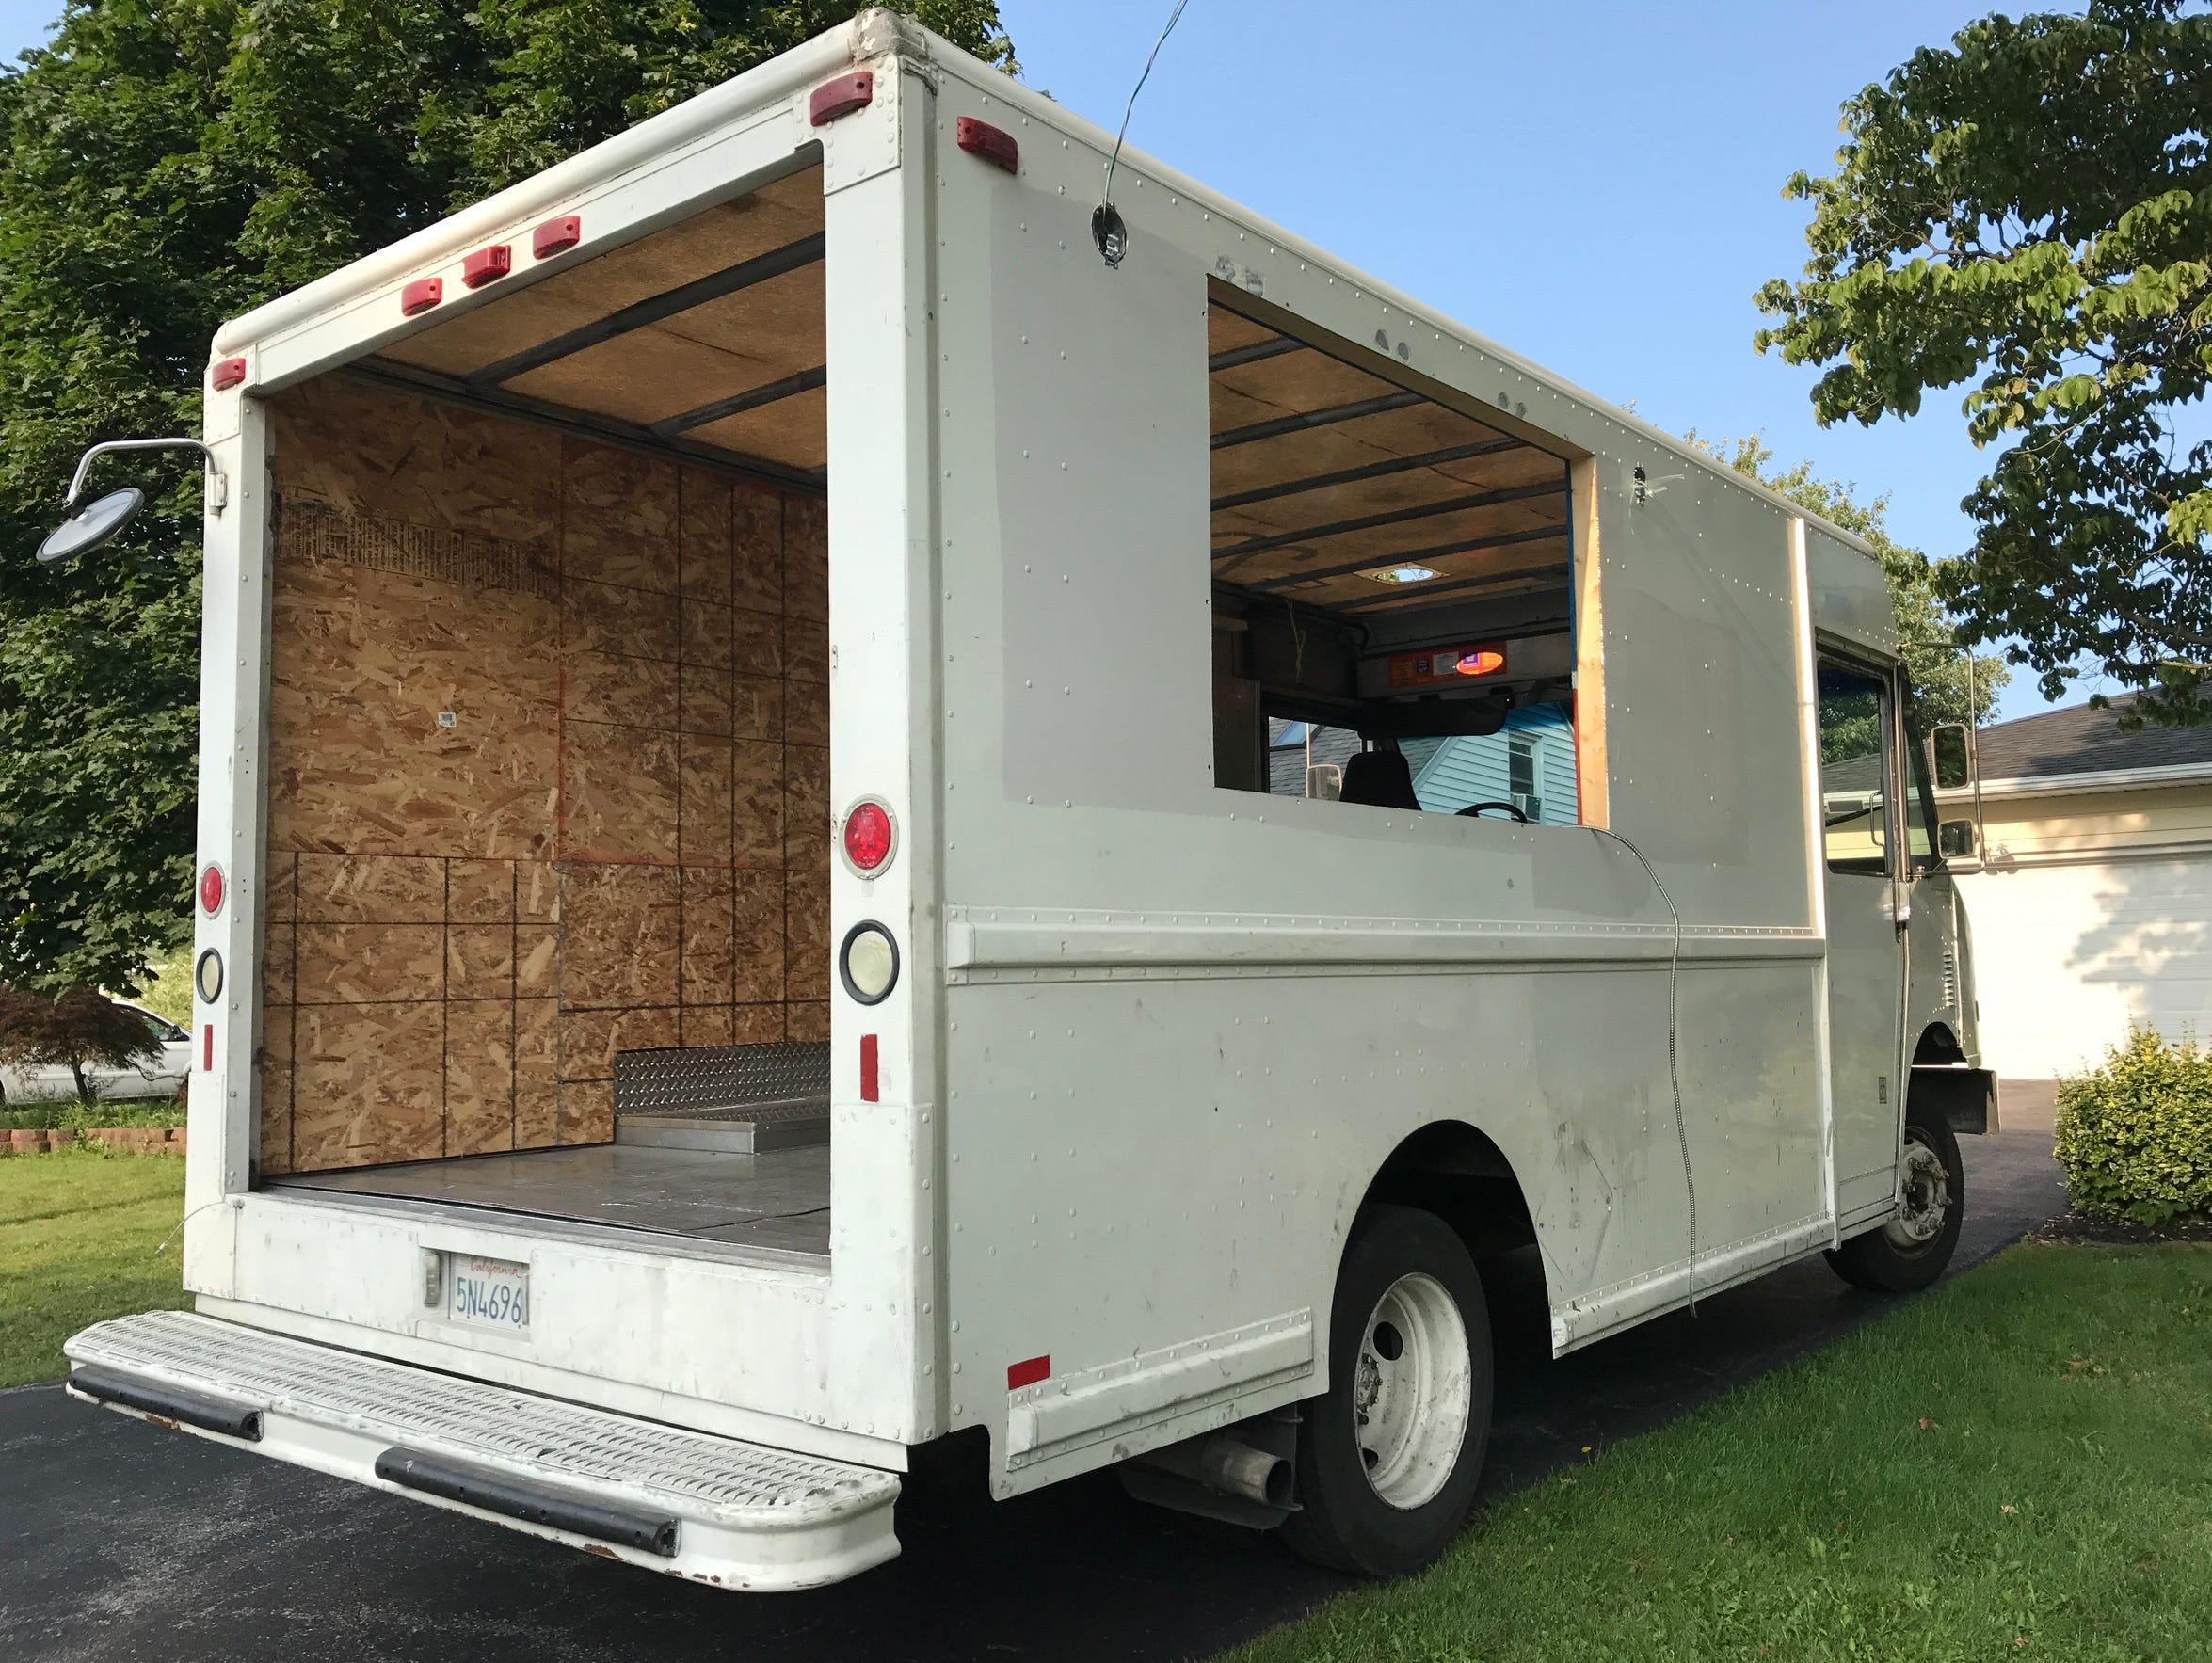 food truck builder m design burns small business owners nationwide. Black Bedroom Furniture Sets. Home Design Ideas